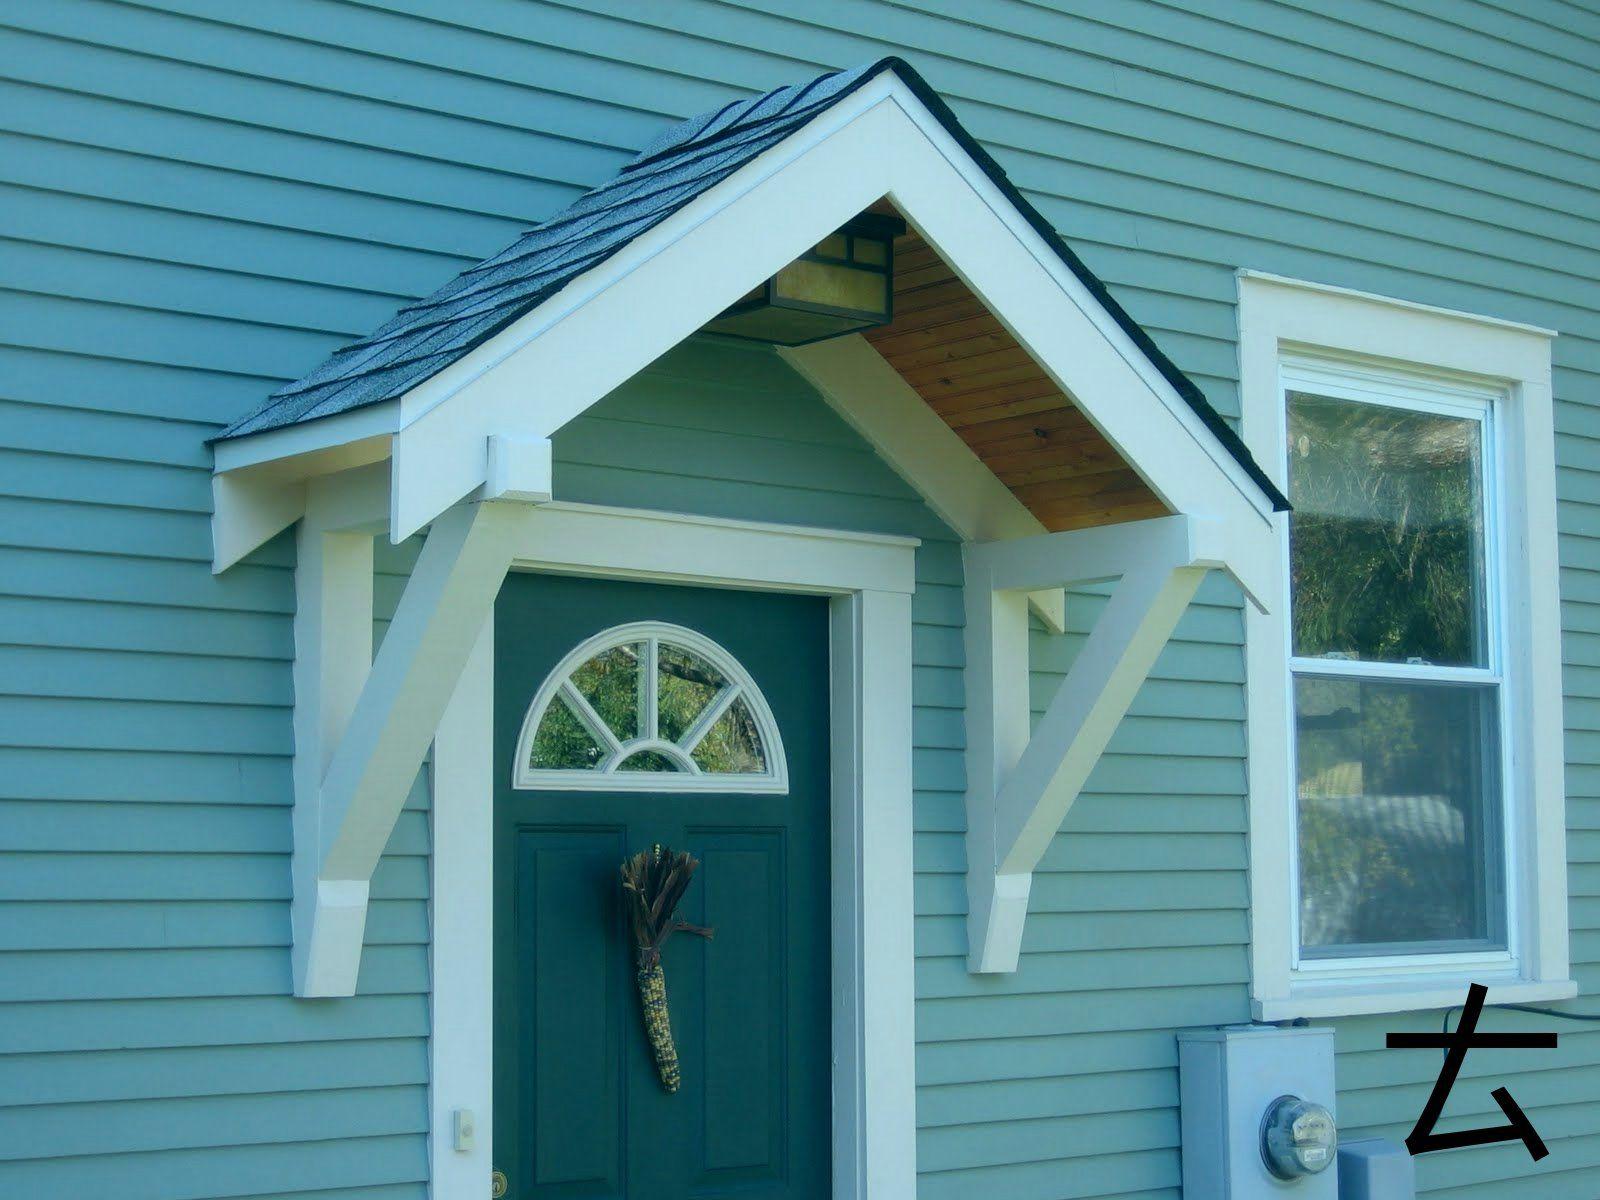 Img 5732 Jpg 1600 1200 Img5732jpg Woodenceilingentrance In 2020 Front Door Awning Door Overhang Front Door Overhang